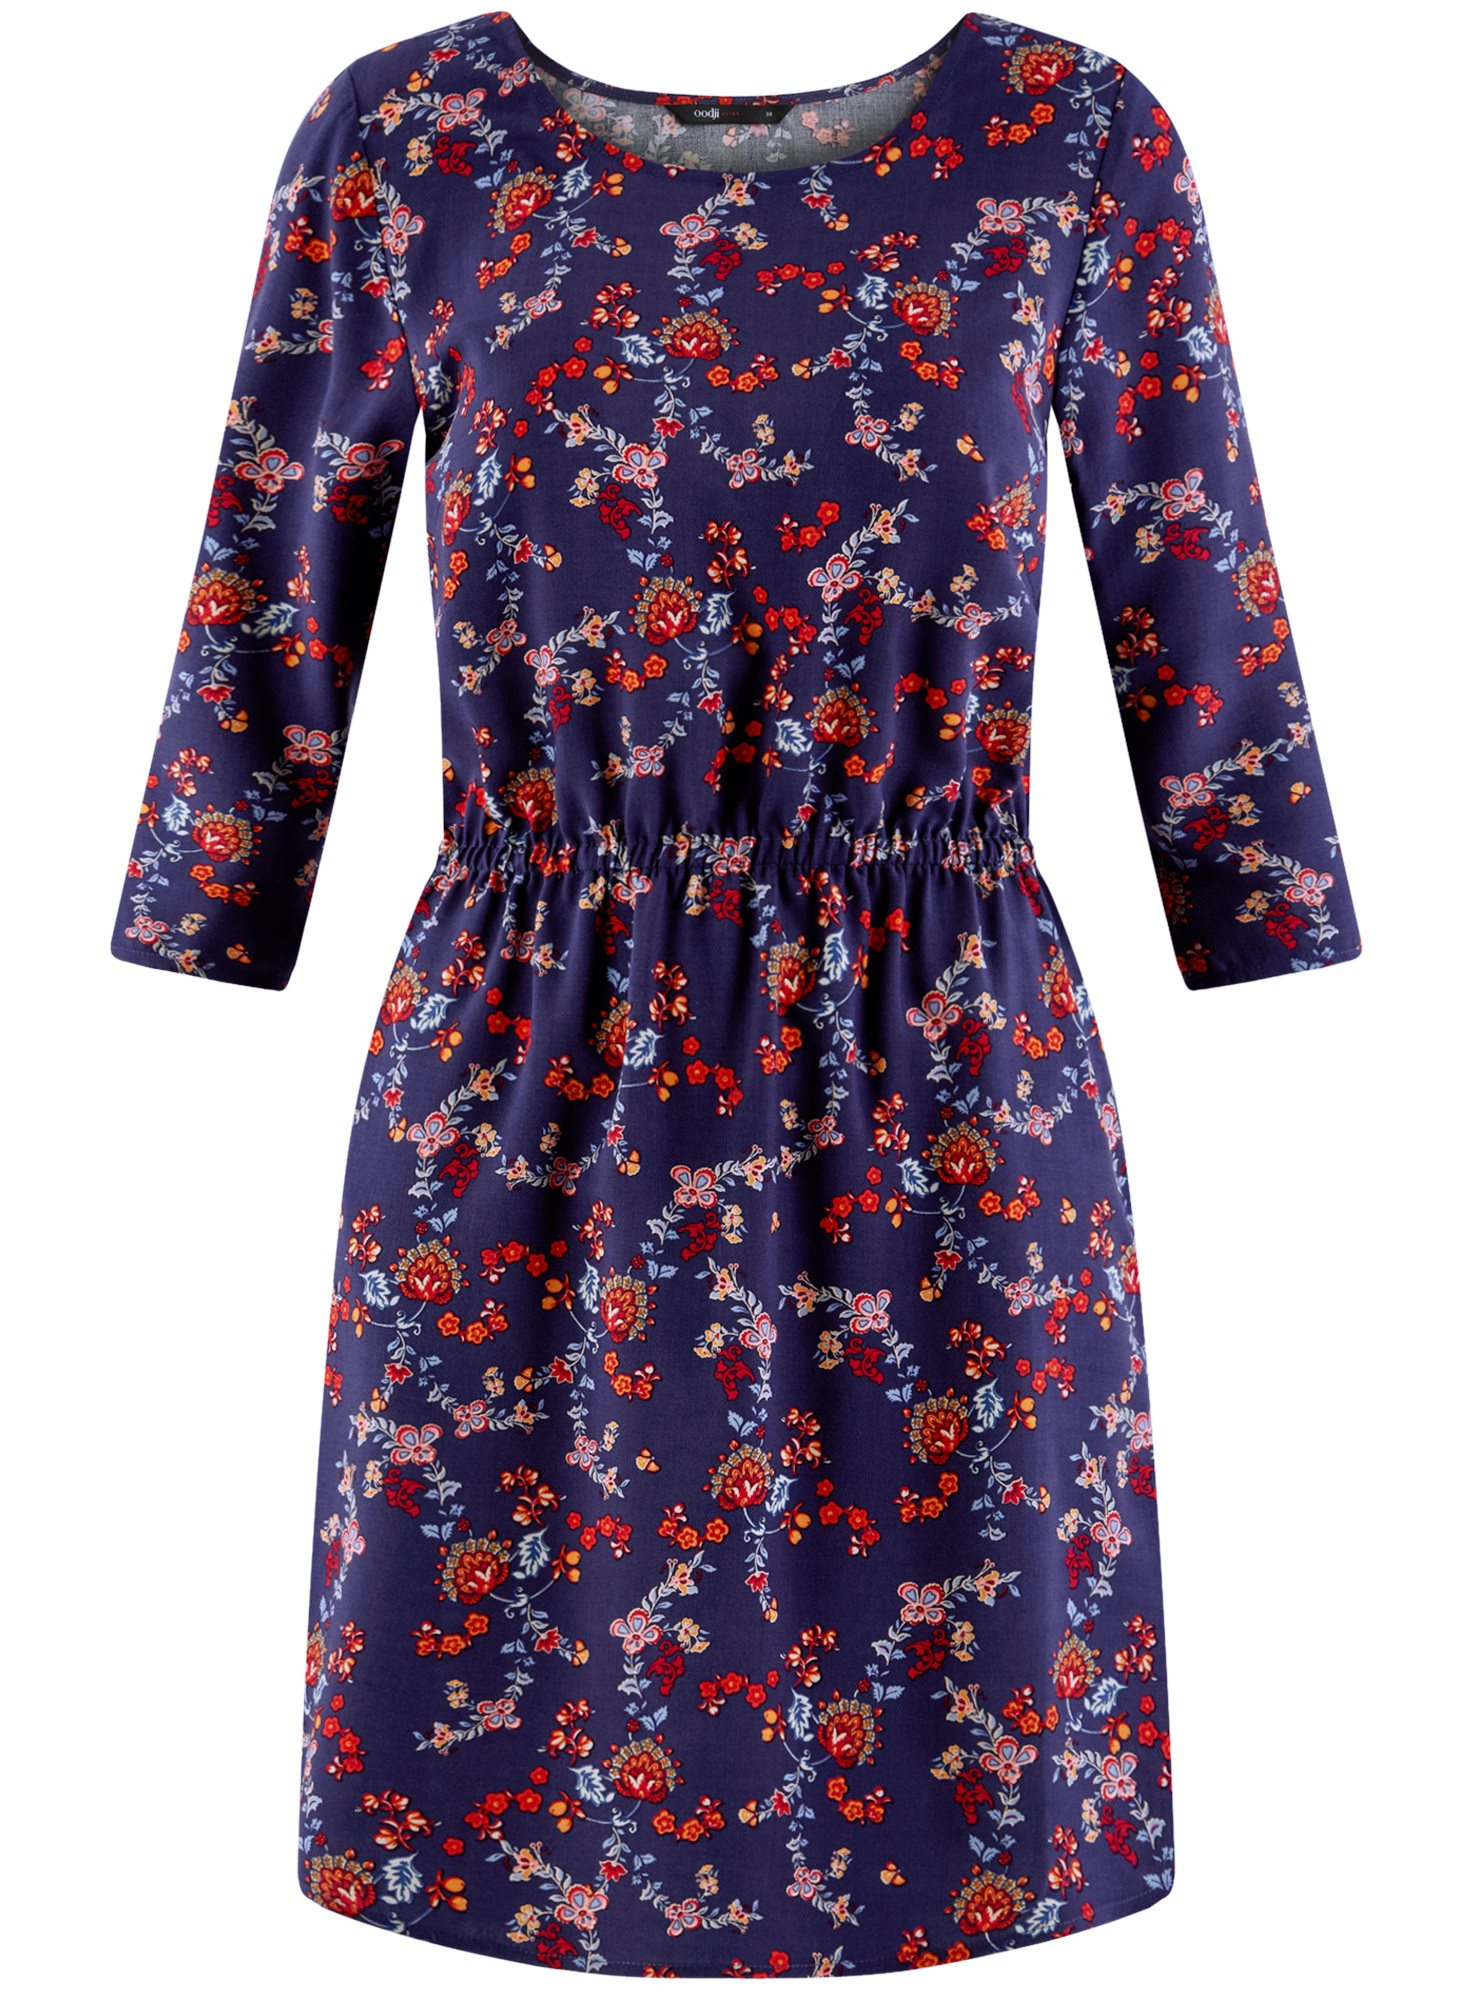 Платье вискозное с рукавом 3/4 oodji для женщины (синий), 11901153-1B/42540/7945E